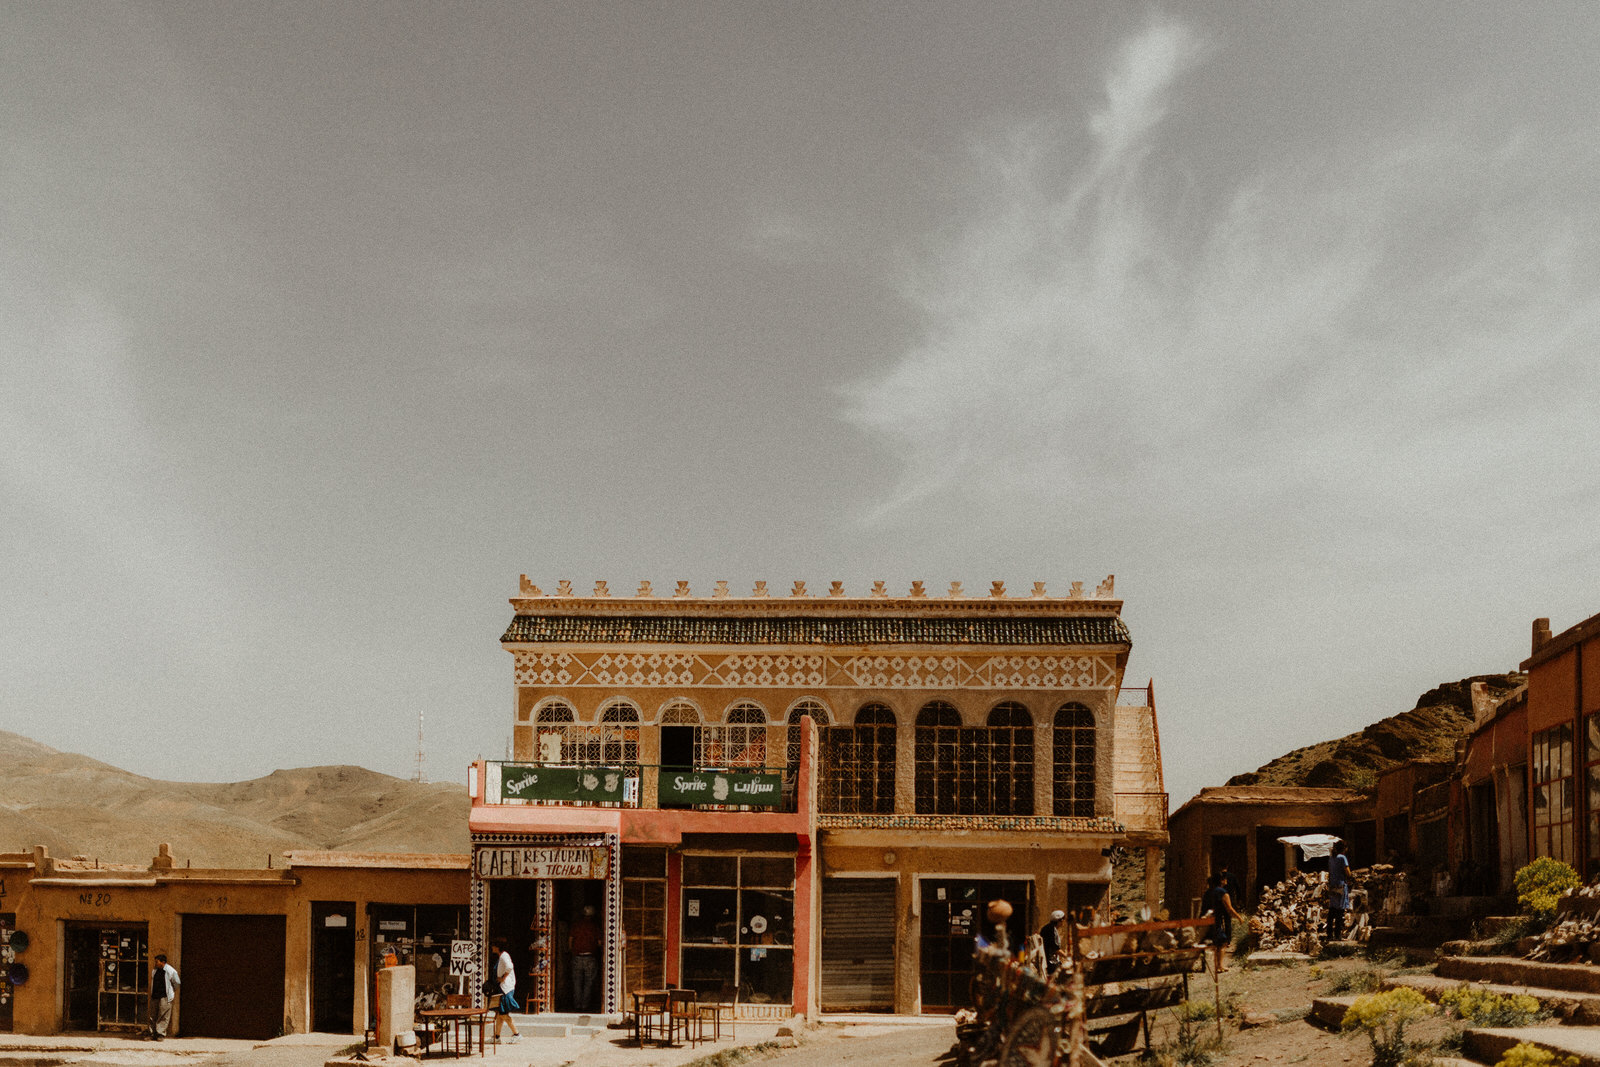 morocco-maroc-turism-lovers-fell-desert